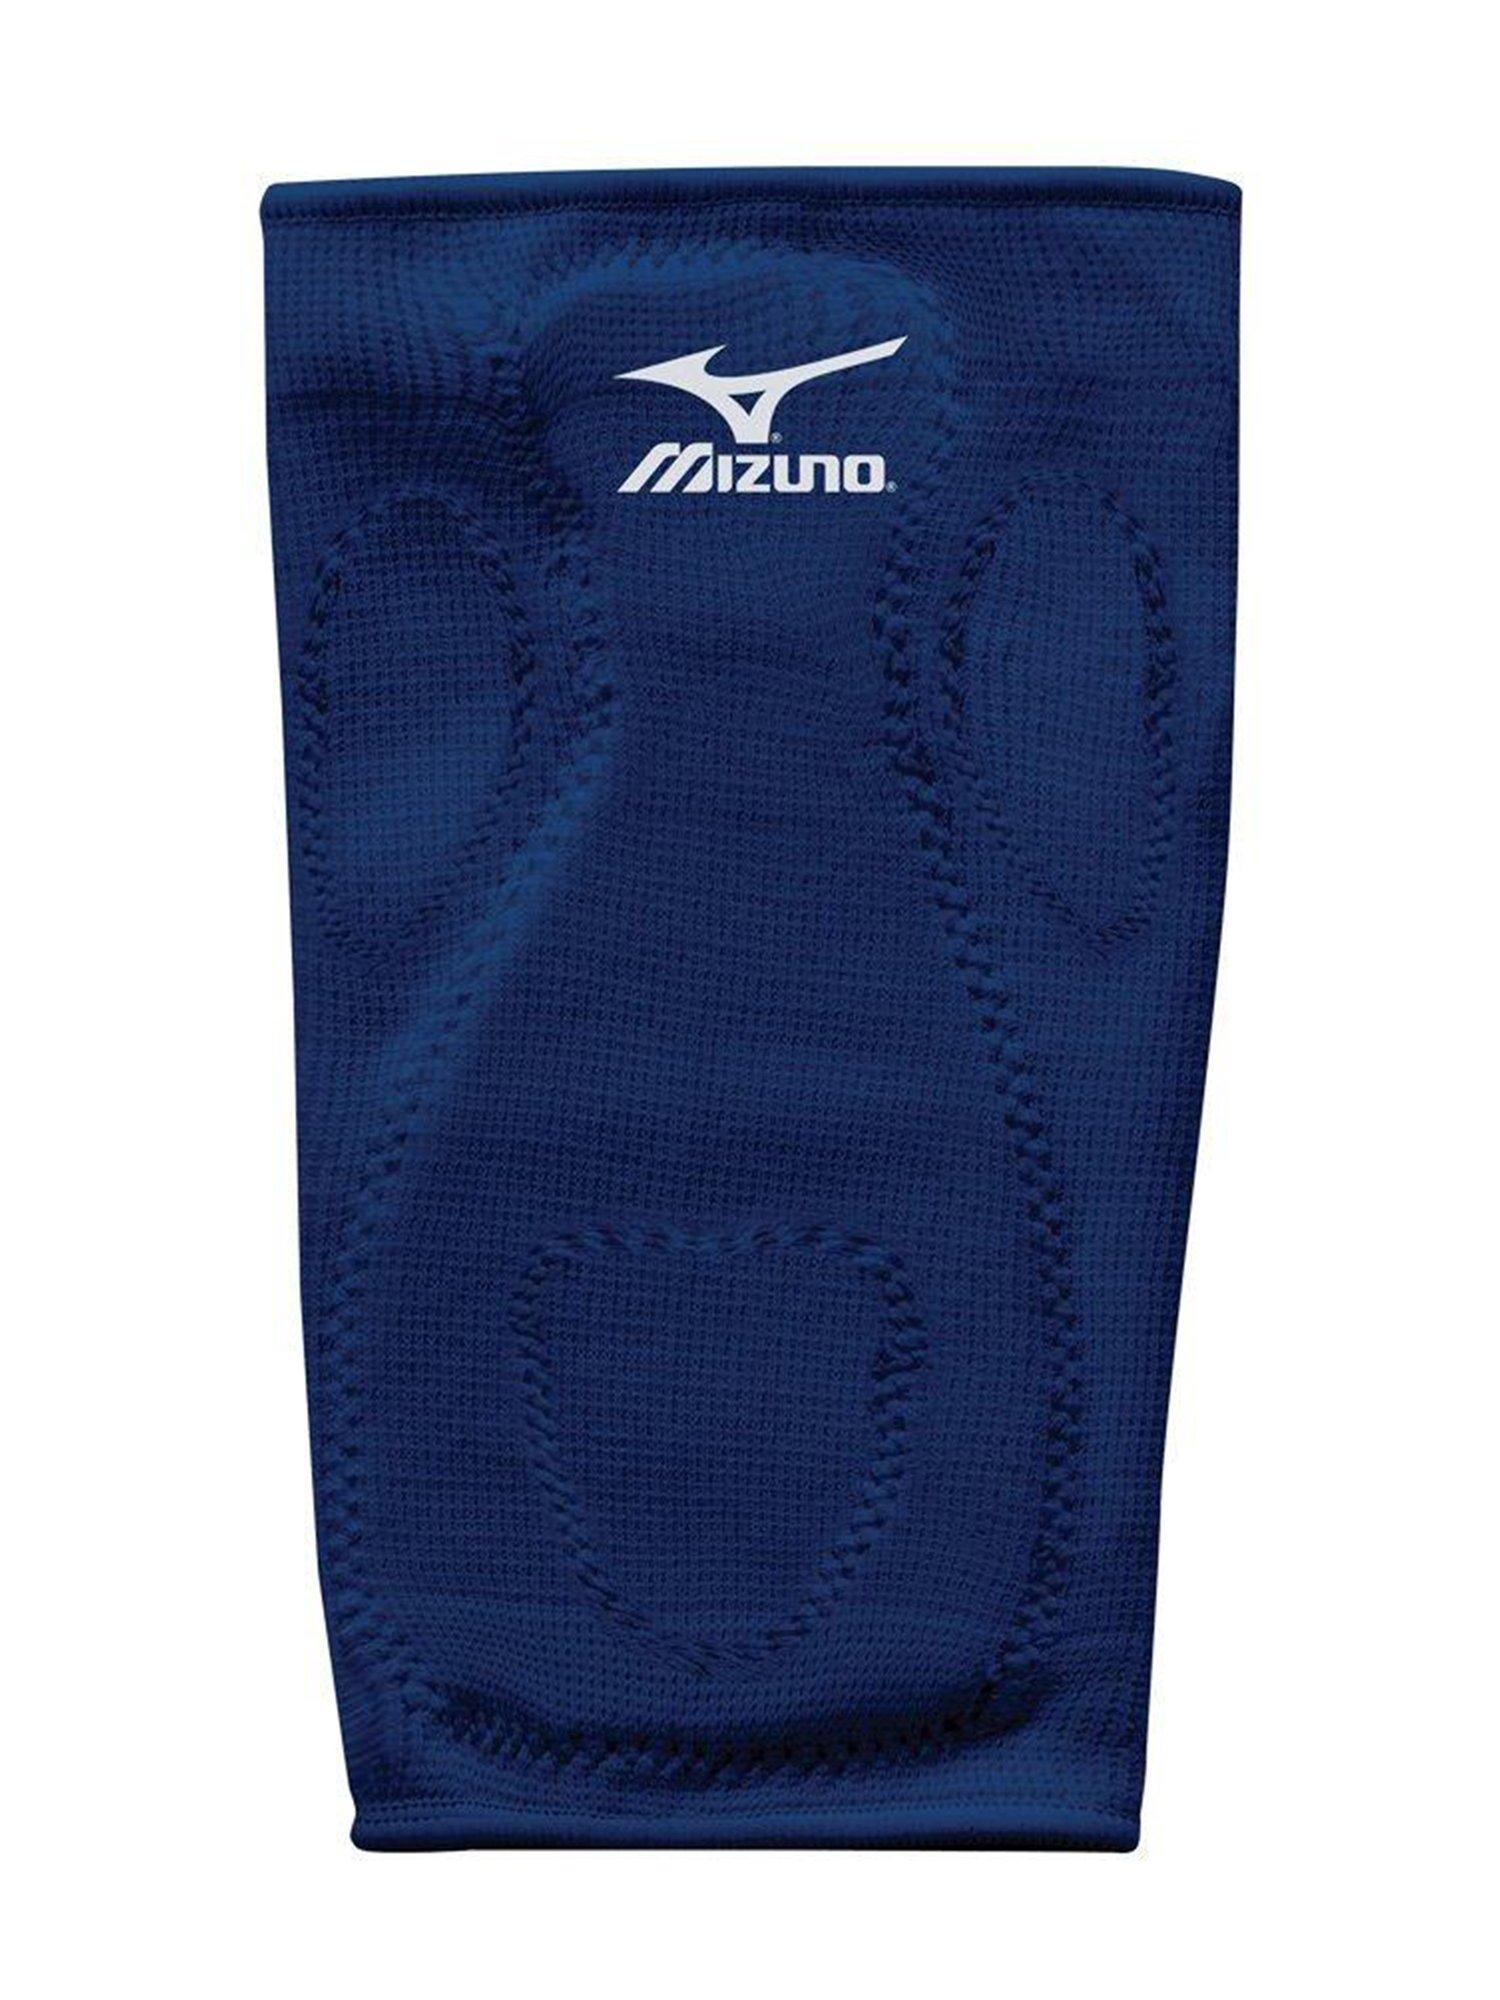 Mizuno-Baseball-Accessories-Slider-Kneepad-370108